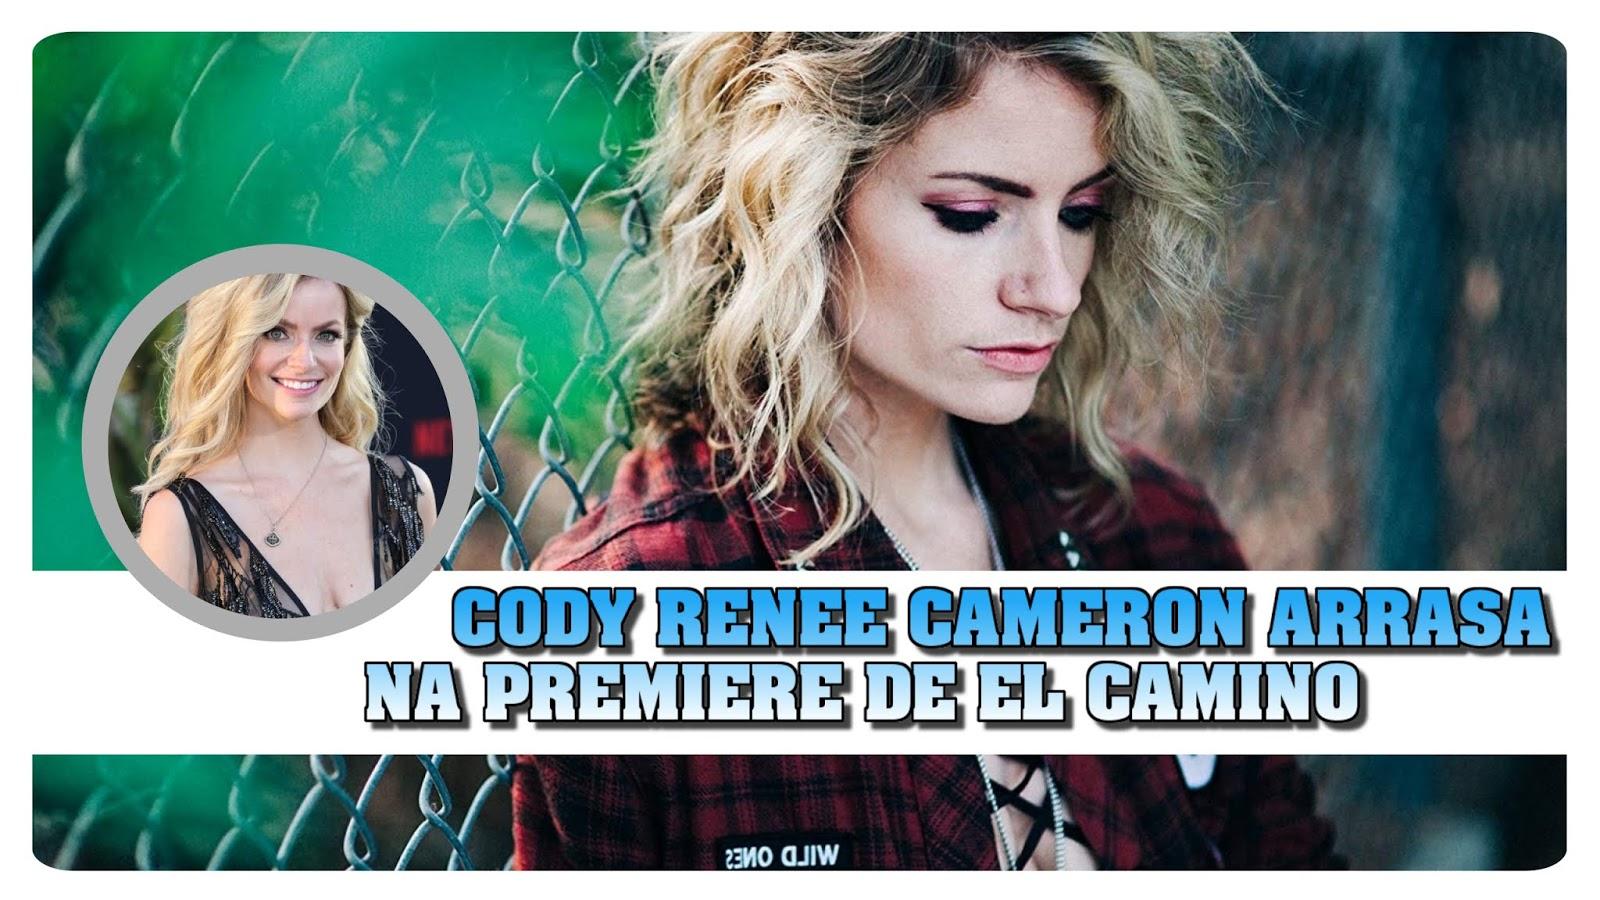 cody-renee-cameron-arrasa-na-premiere